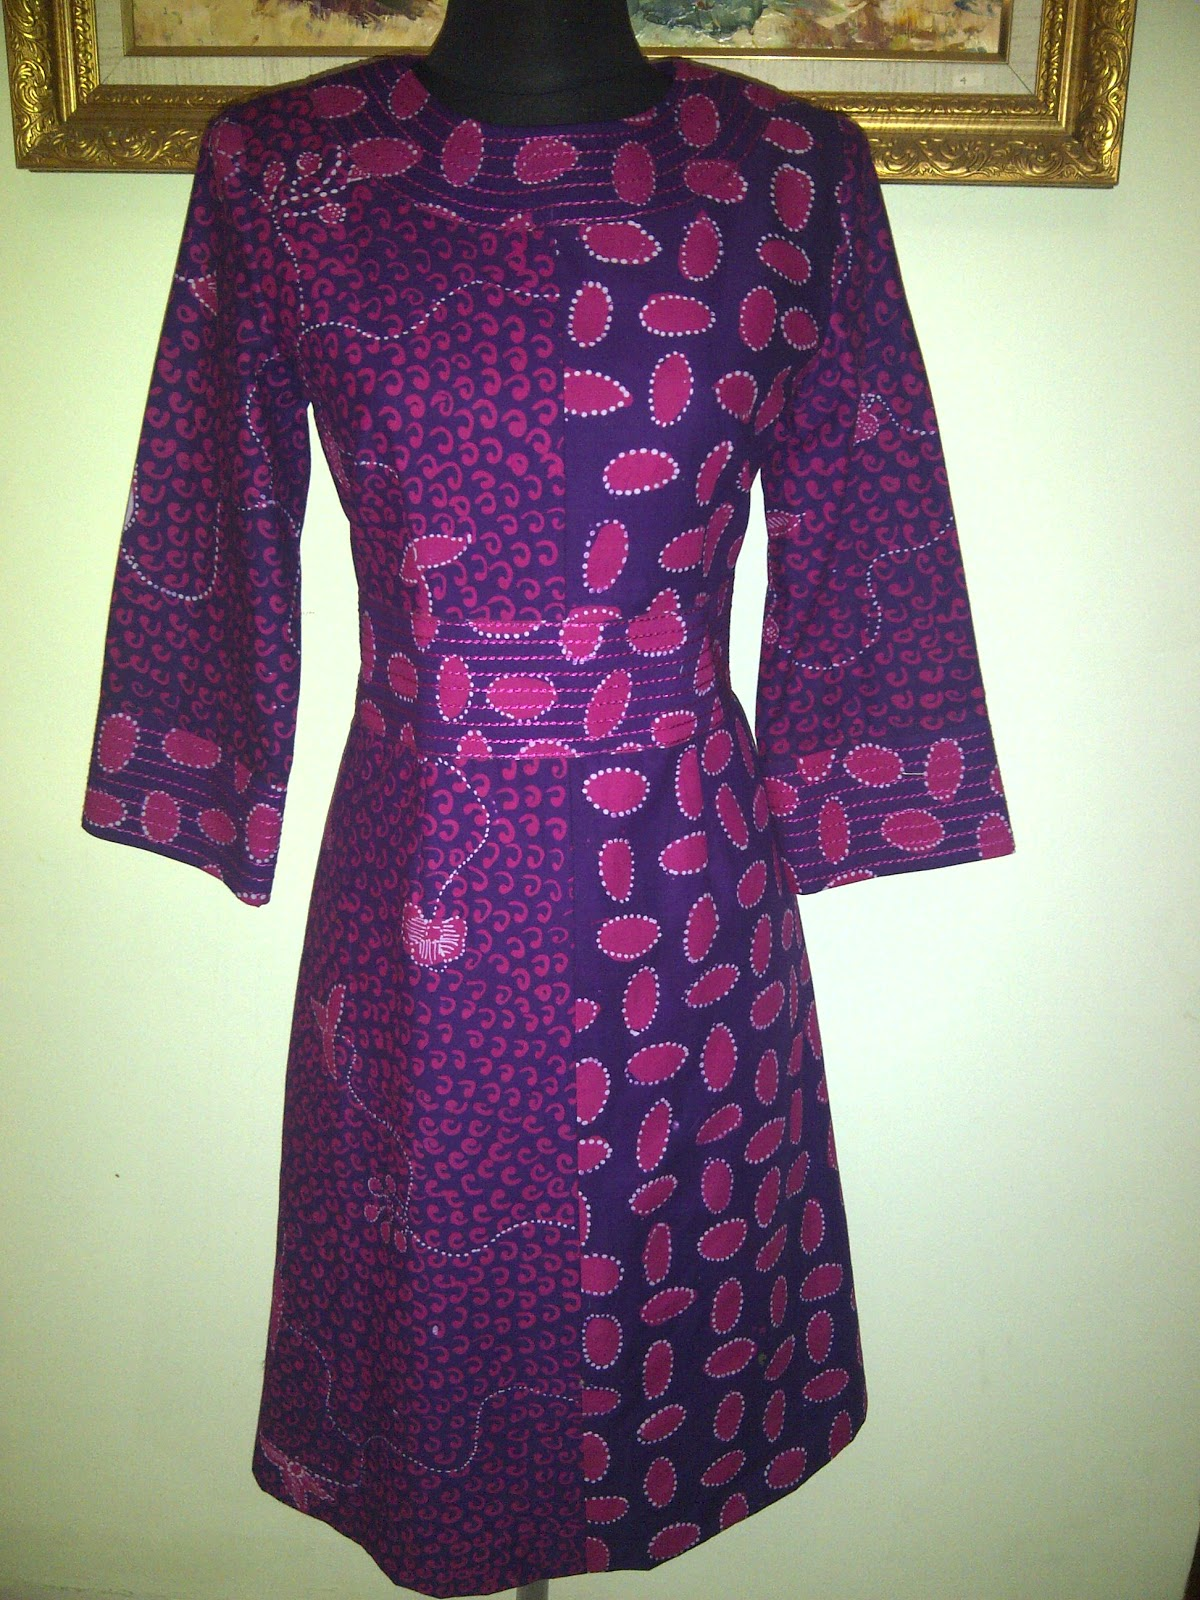 Hn Collection Dress Batik Madura Pagi Sore Model Baju